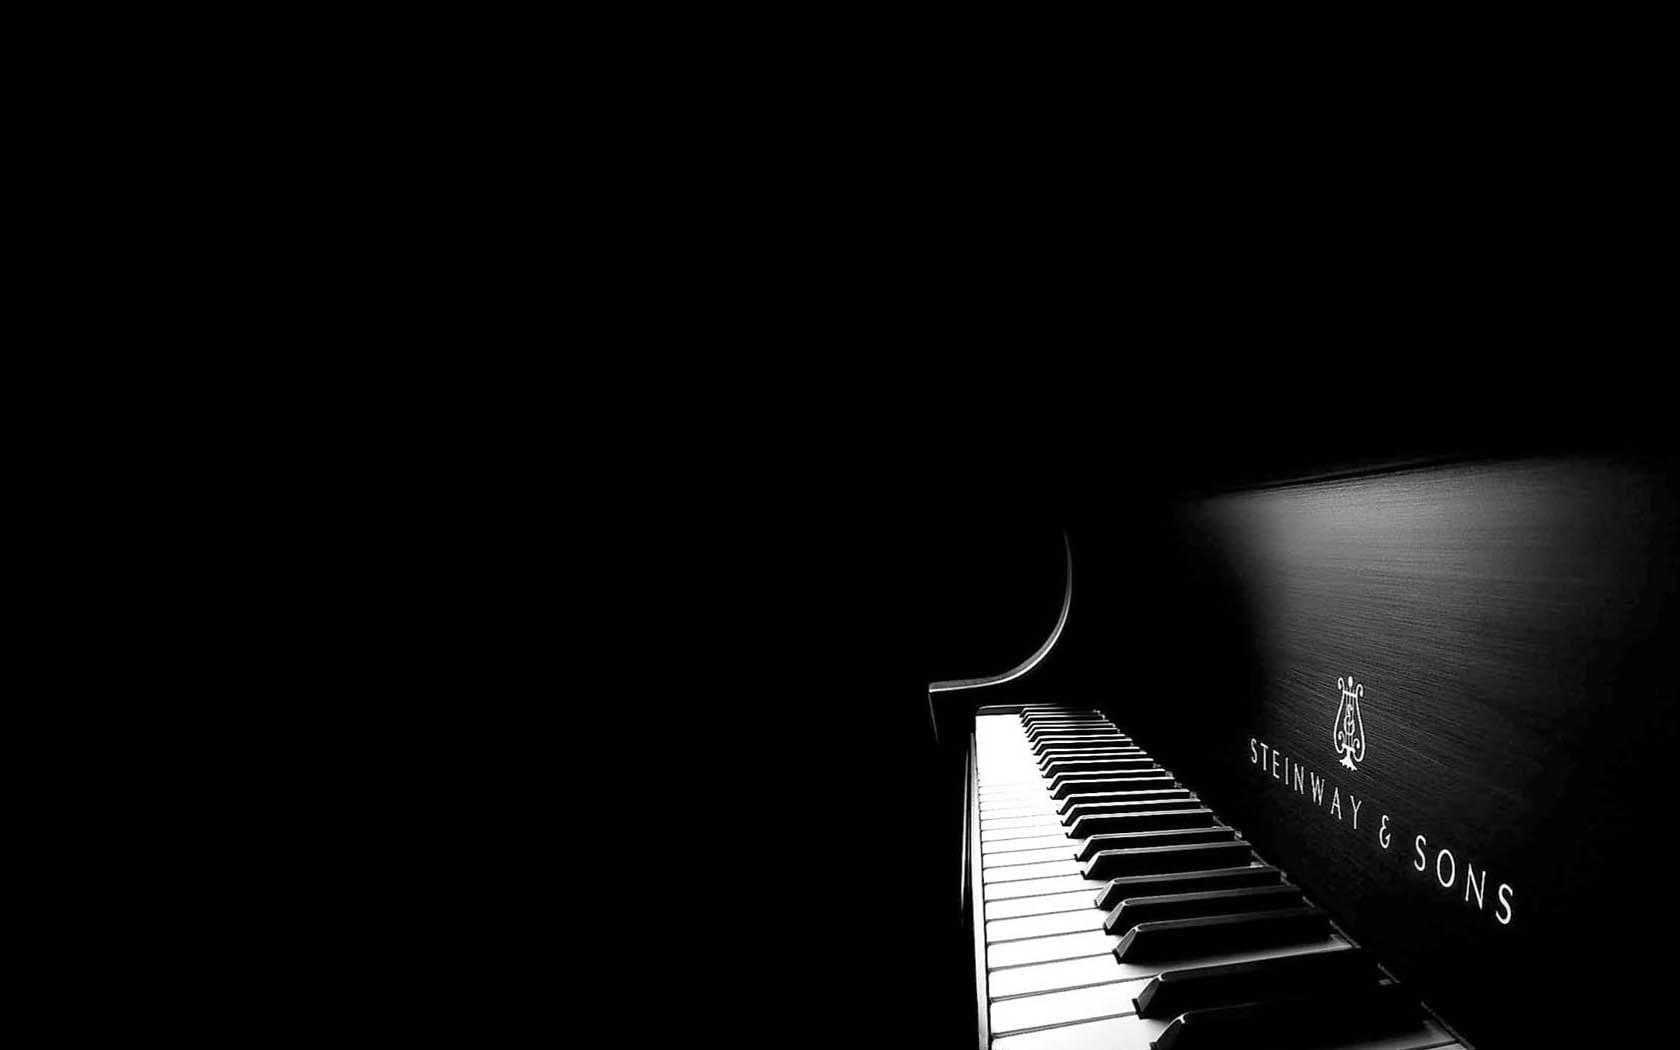 Steve Belgiorono Plays Piano Live at Nathaniel's Restaurant in Salem, MA